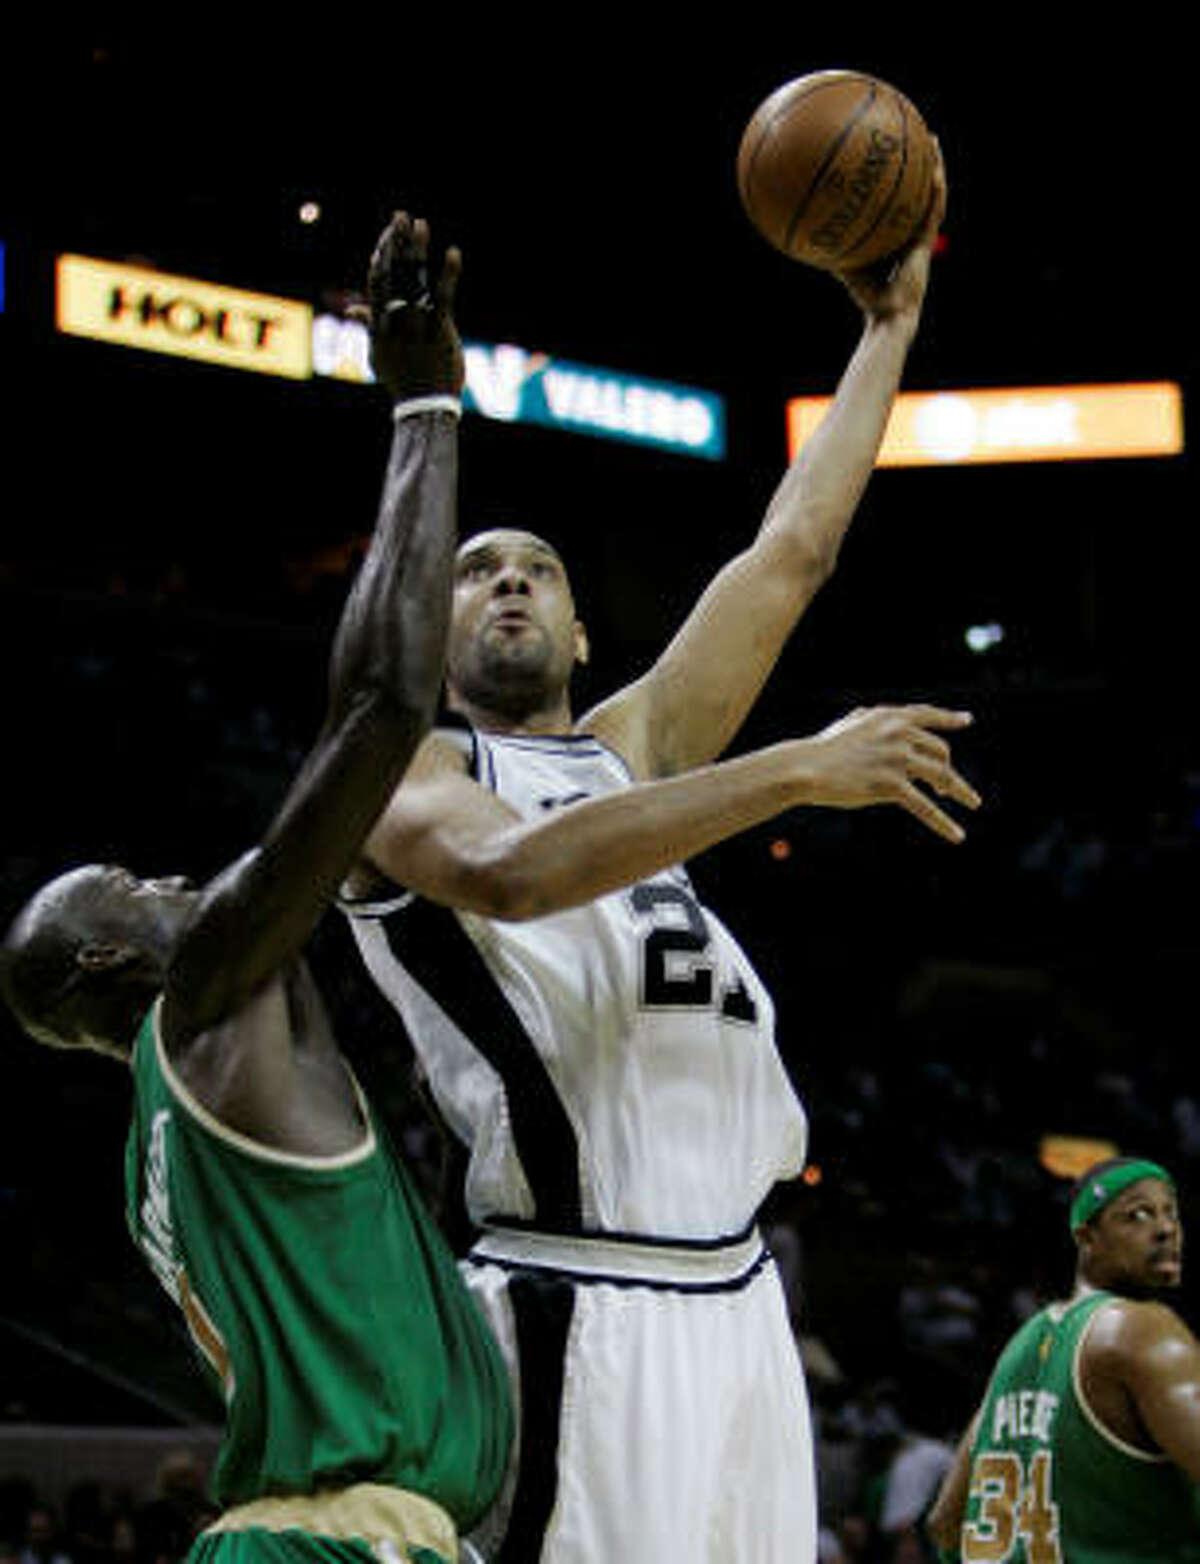 Spurs forward Tim Duncan, right, shoot over Celtics forward Kevin Garnett during the first quarter. Duncan scored 10 points in 34 minutes.